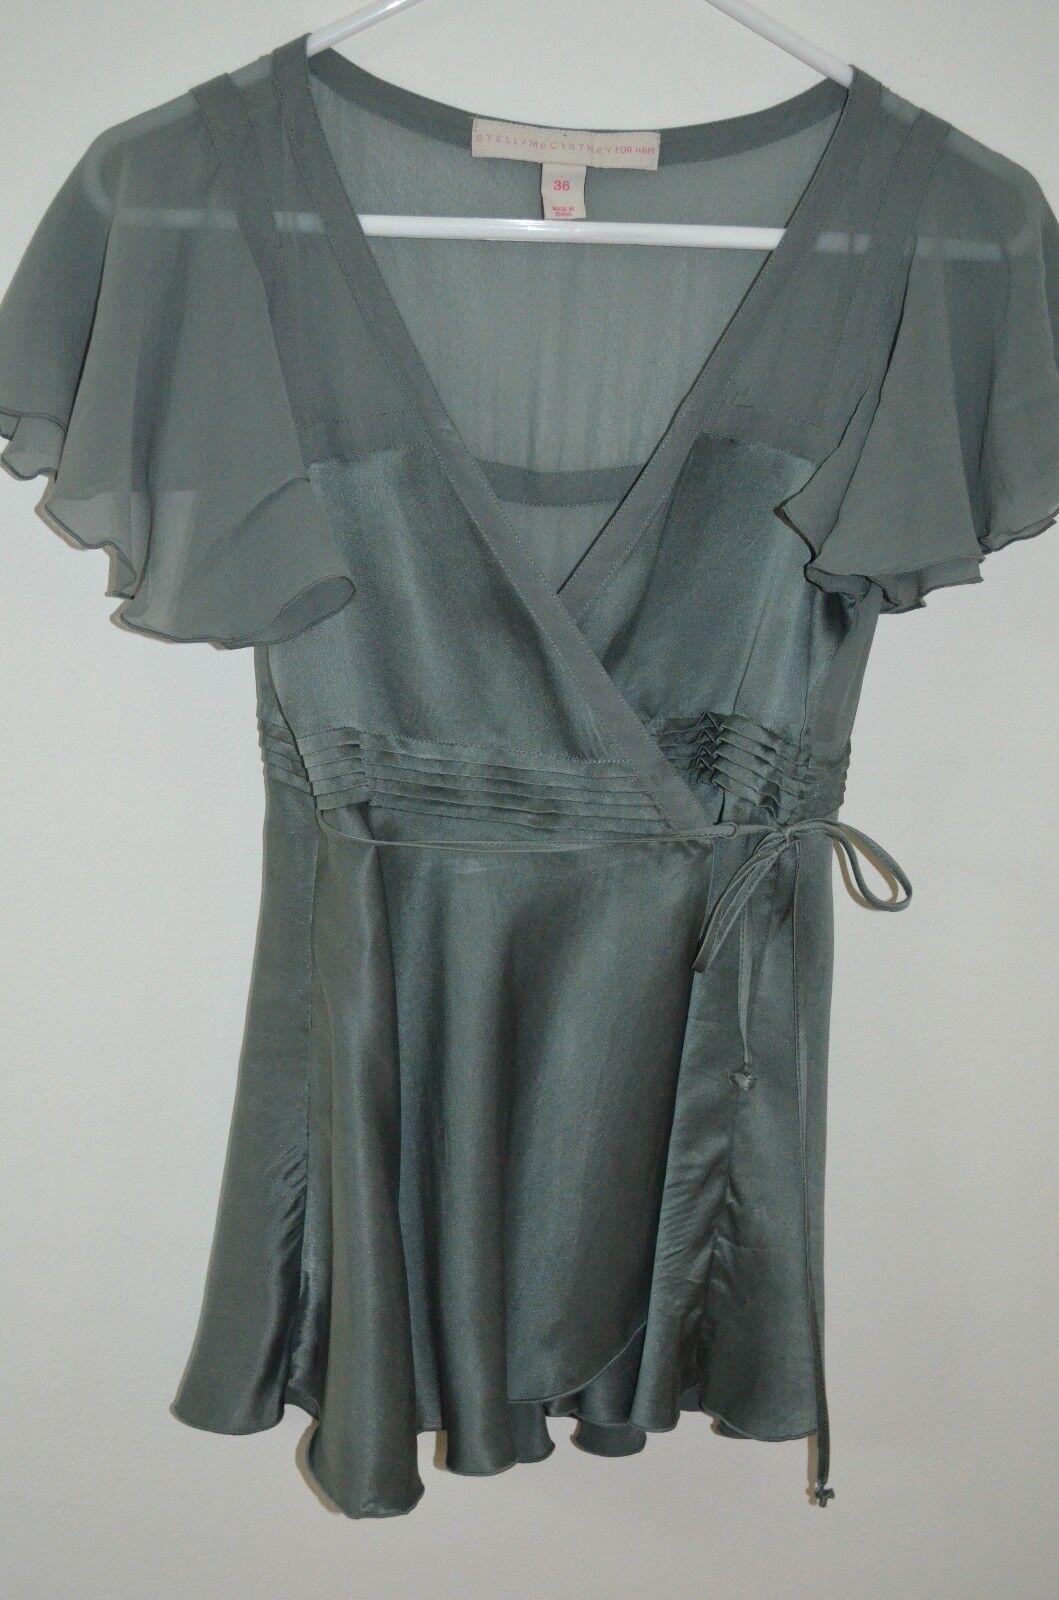 Stella McCartney for H & M Grün 100% Silk Flutter Sleeve Wrap Blouse Größe 36